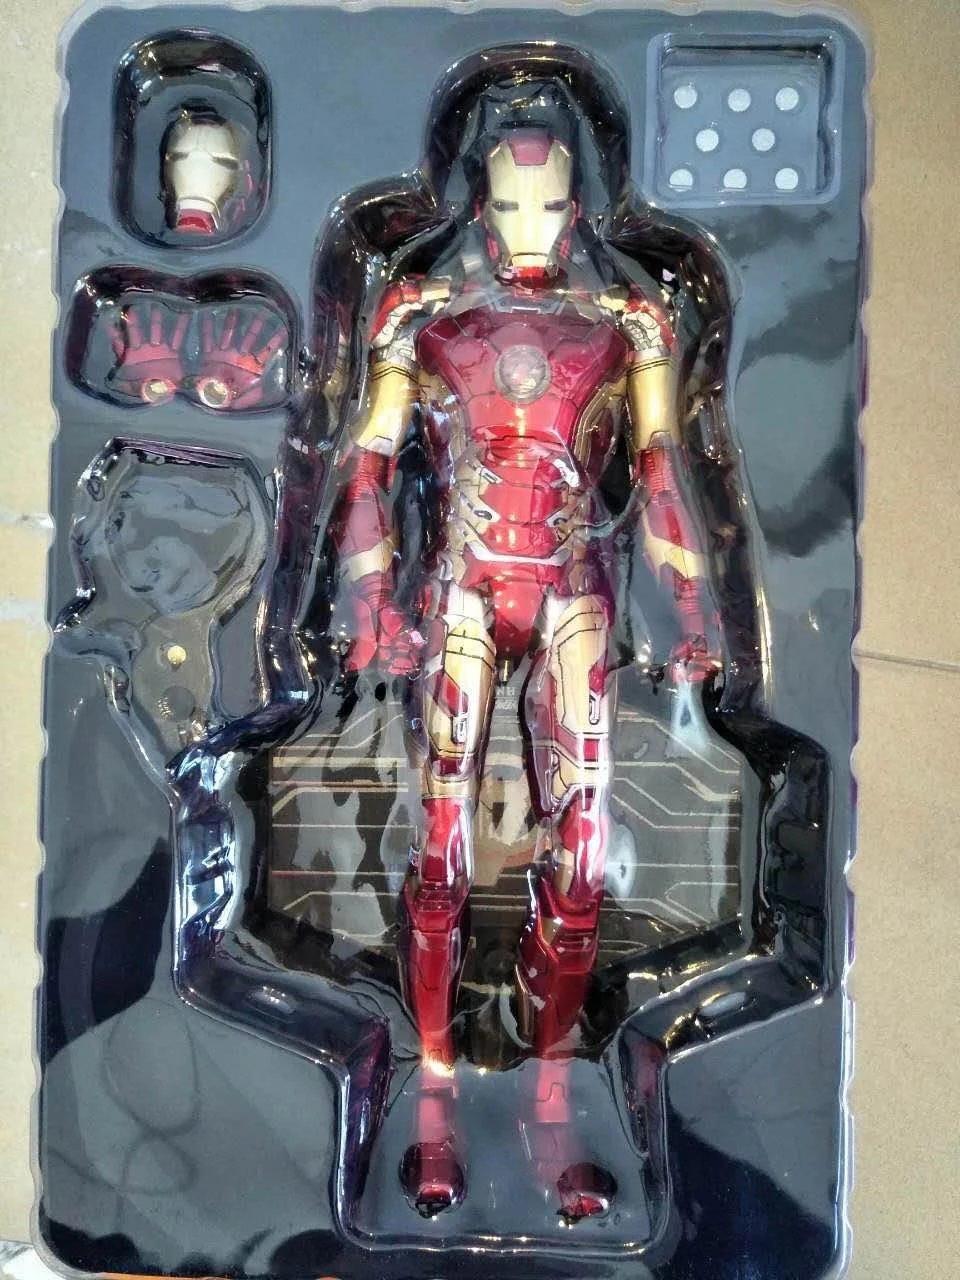 HC Iron Man Mark MK 42 RED x GOLD PVC Action Figure Collectible Model Toy with LED Light 28cm super hero iron man 3 mark 42 tony stark set cute 10cm pvc action figure collection model toy 349 free shipping 324